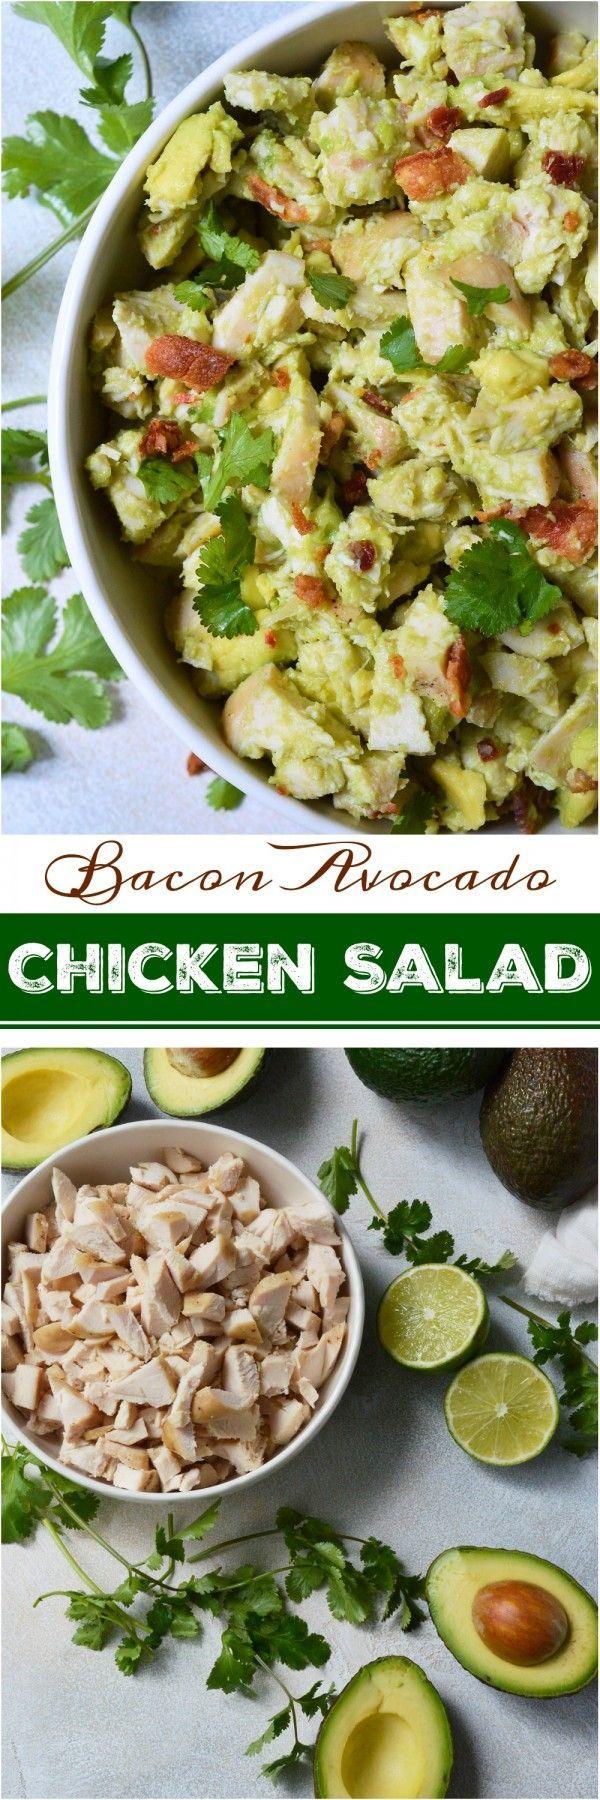 Get the recipe Bacon Avocado Chicken Salad @recipes_to_go